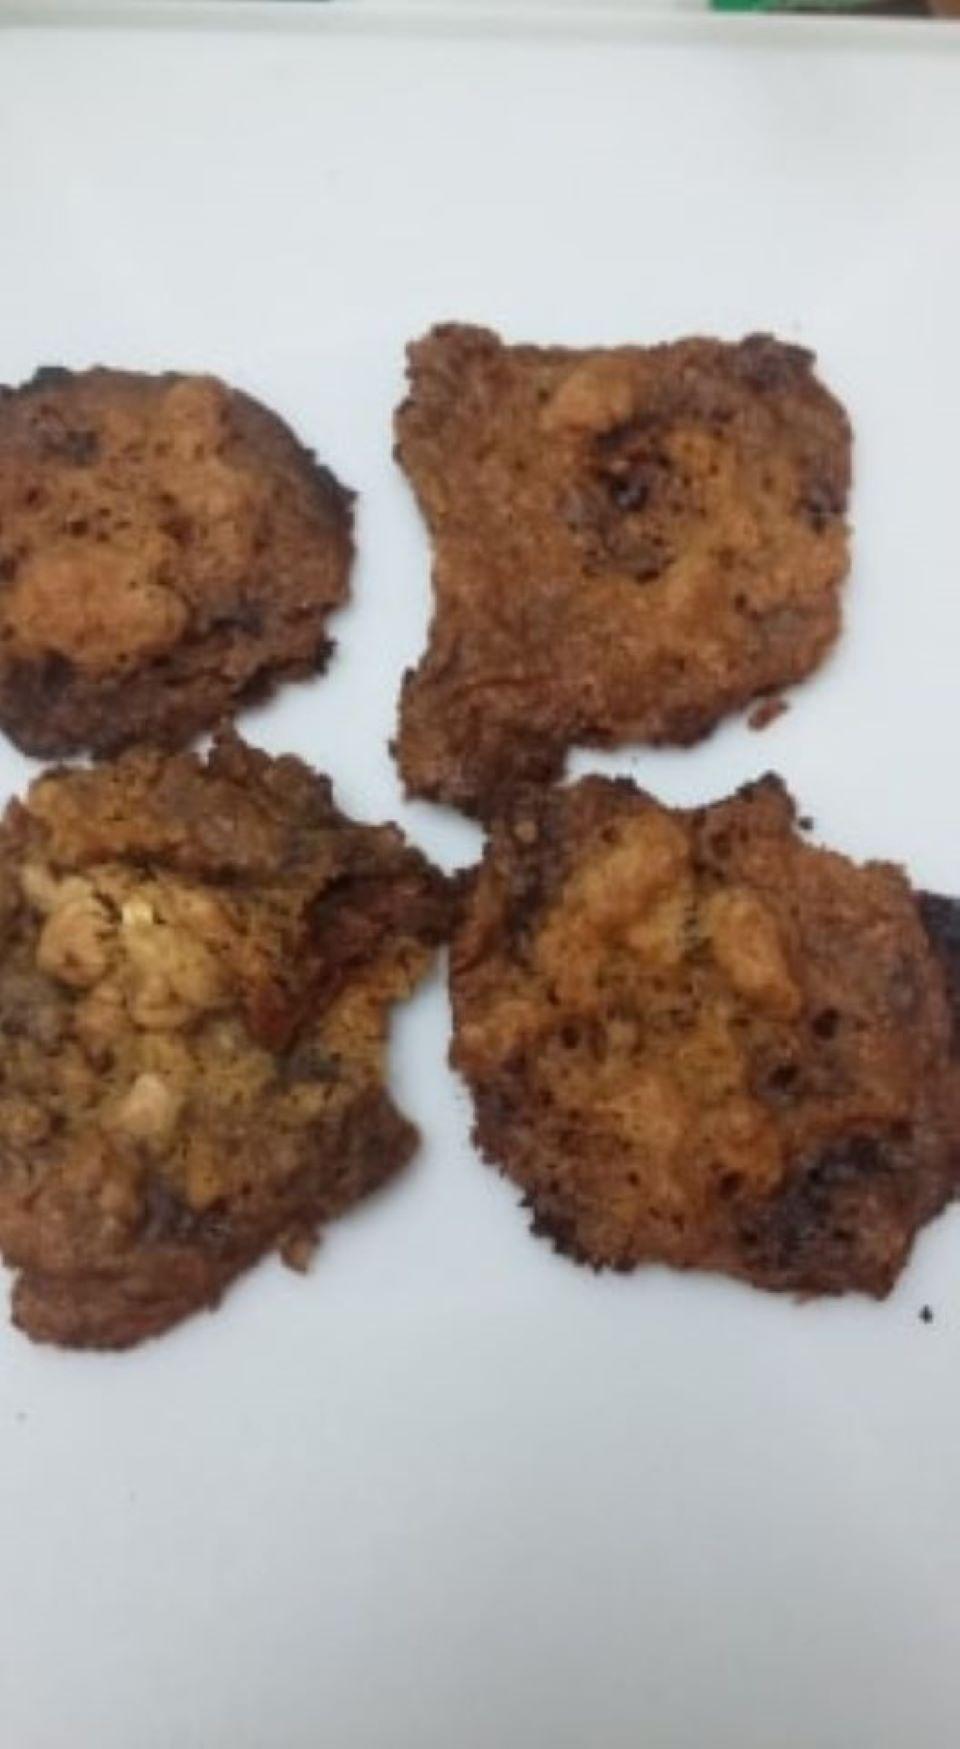 Granola-Chocolate Cookies Danette Duffy